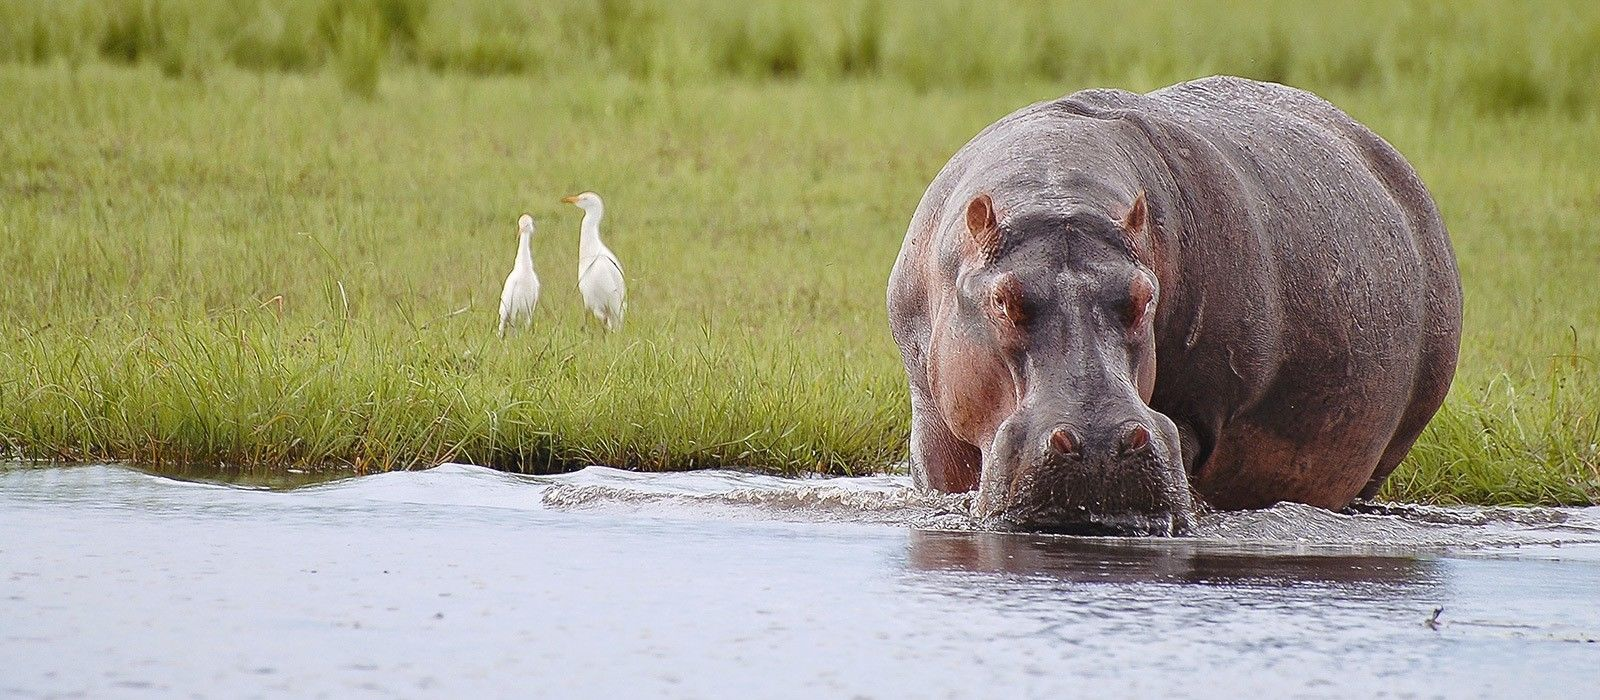 Destination Chobe National Park Botswana